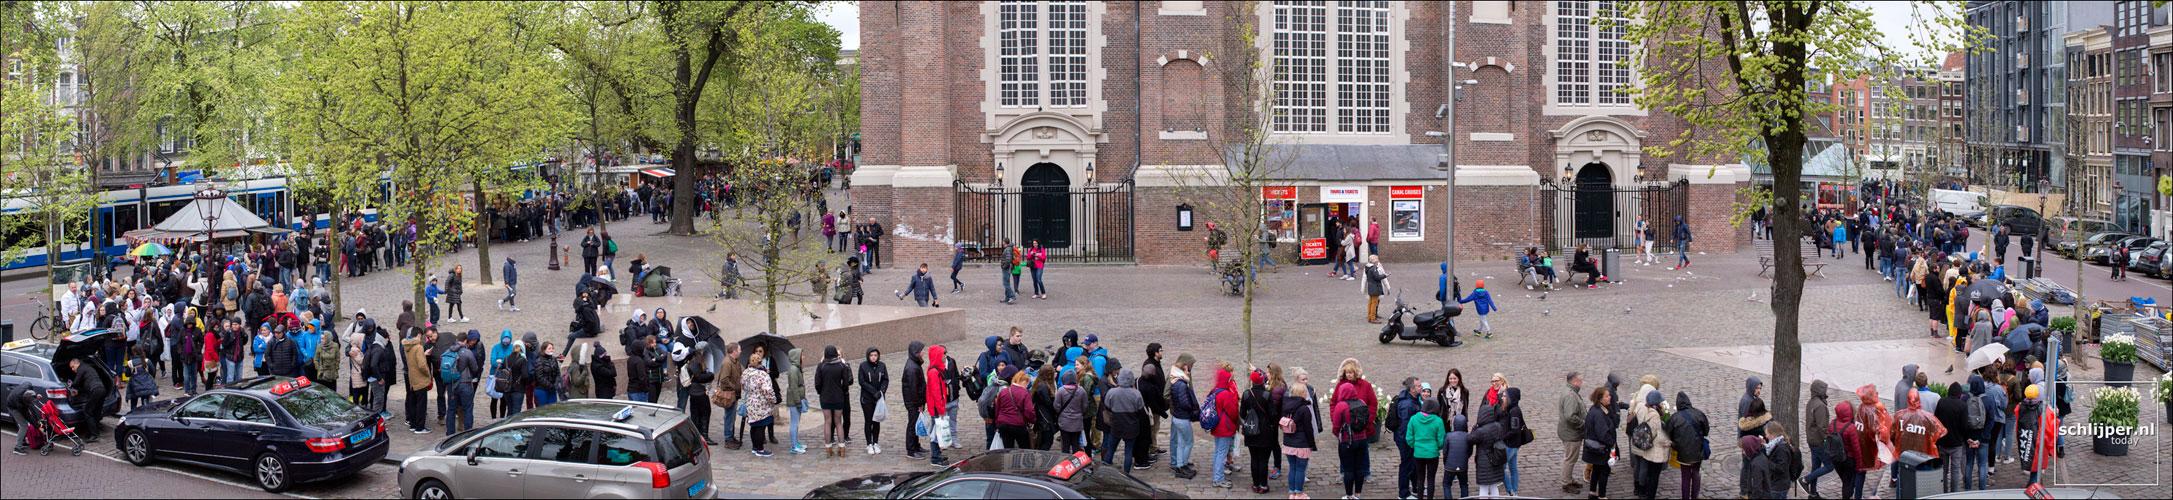 Nederland, Amsterdam, 12 april 2017